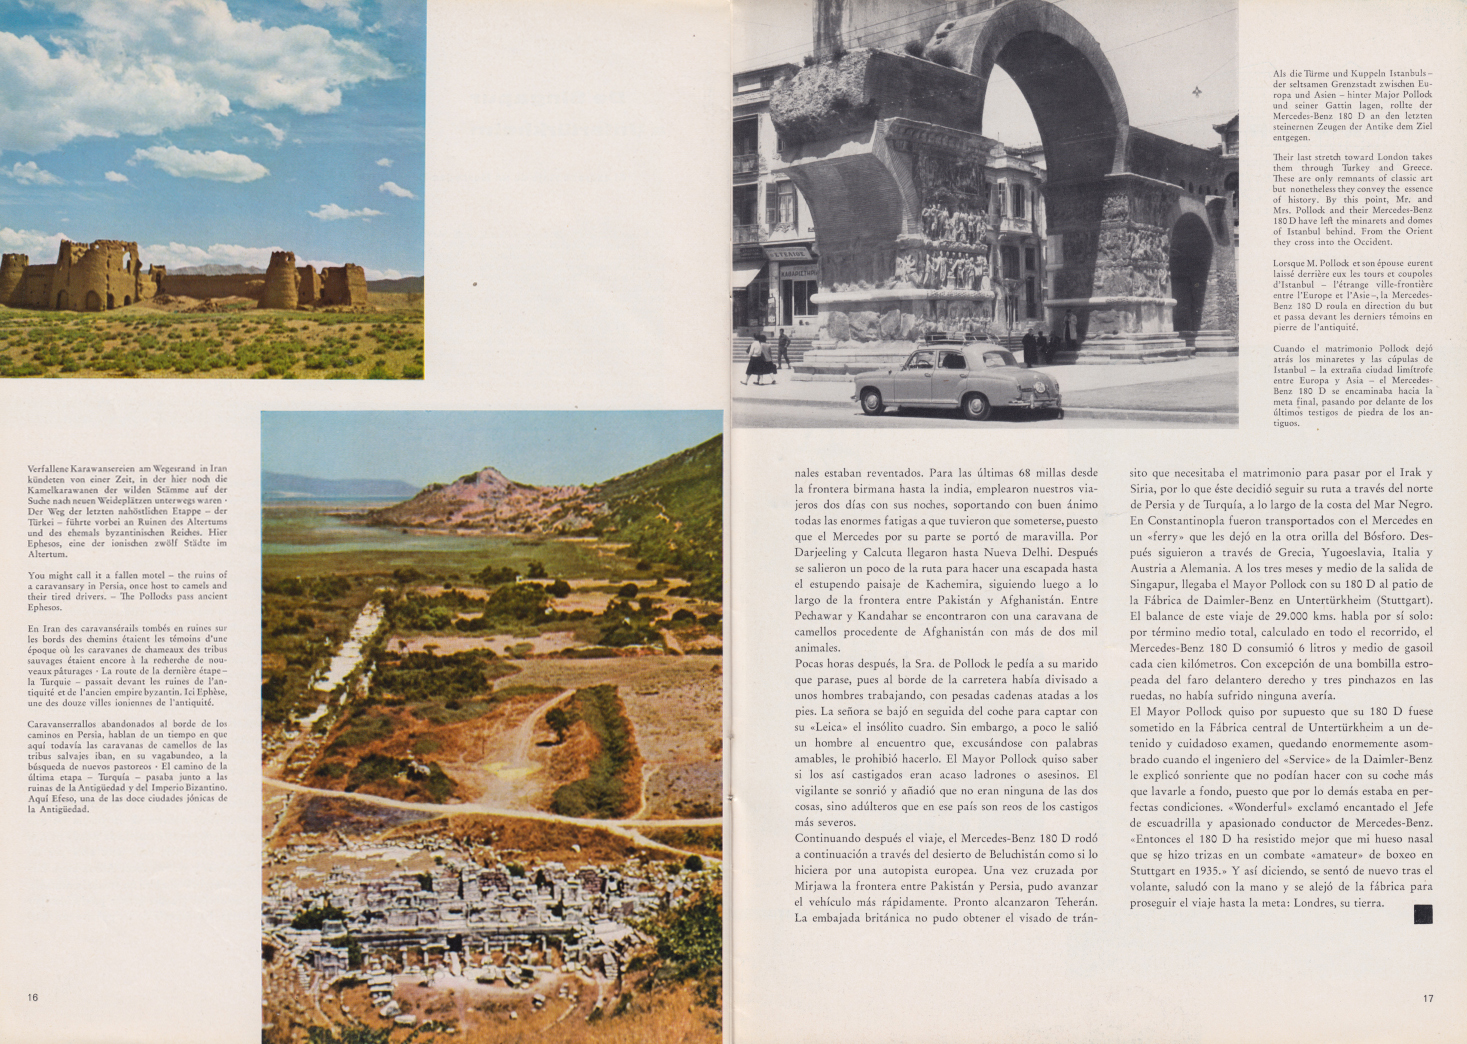 (REVISTA): Periódico In aller welt n.º 32 - Mercedes-Benz no mundo - 1959 - multilingue 009